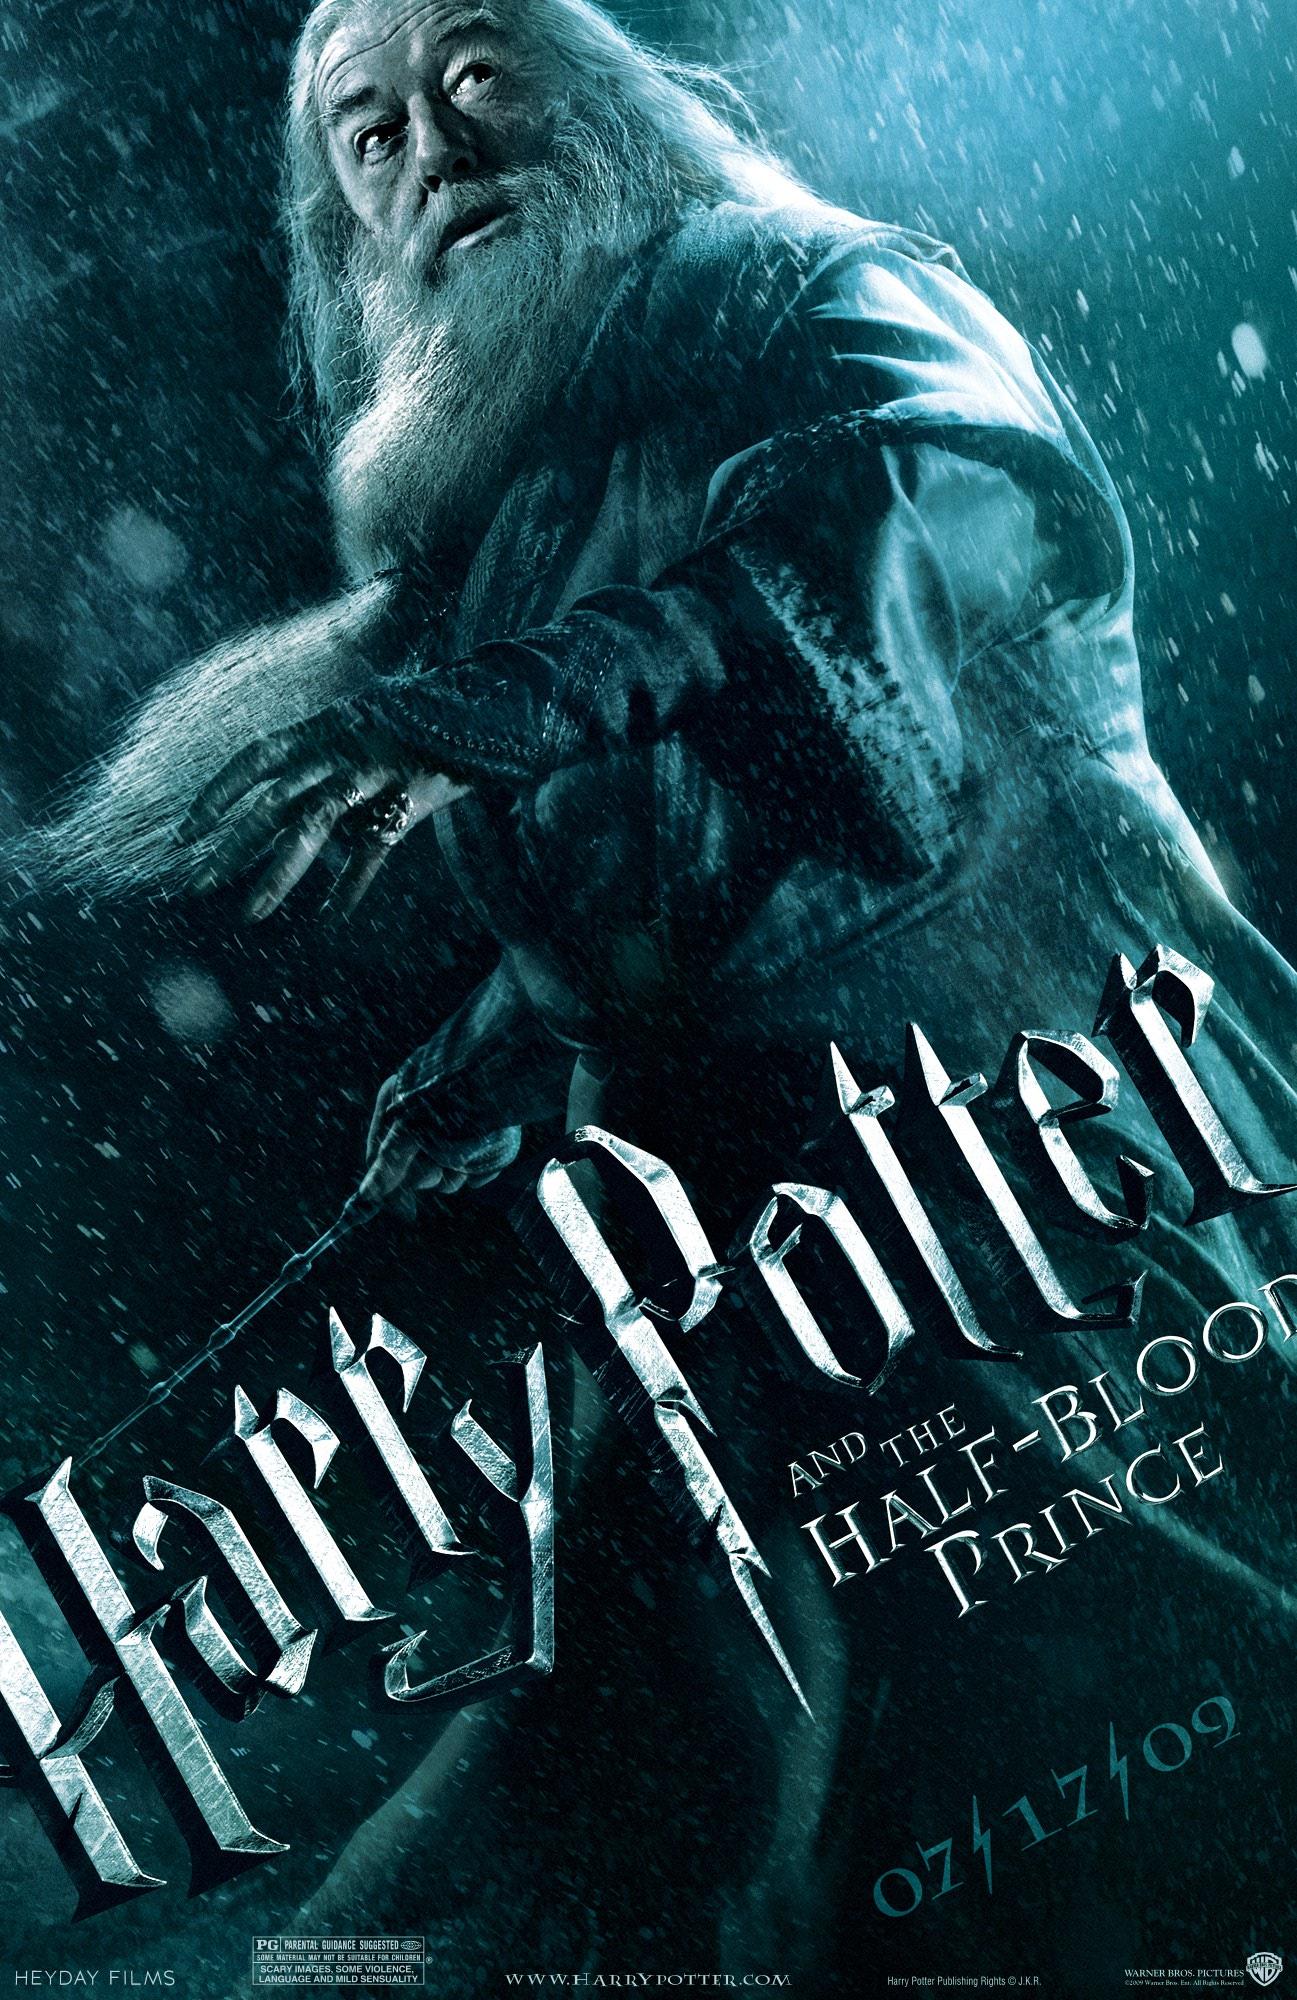 'Half-Blood Prince' Dumbledore poster